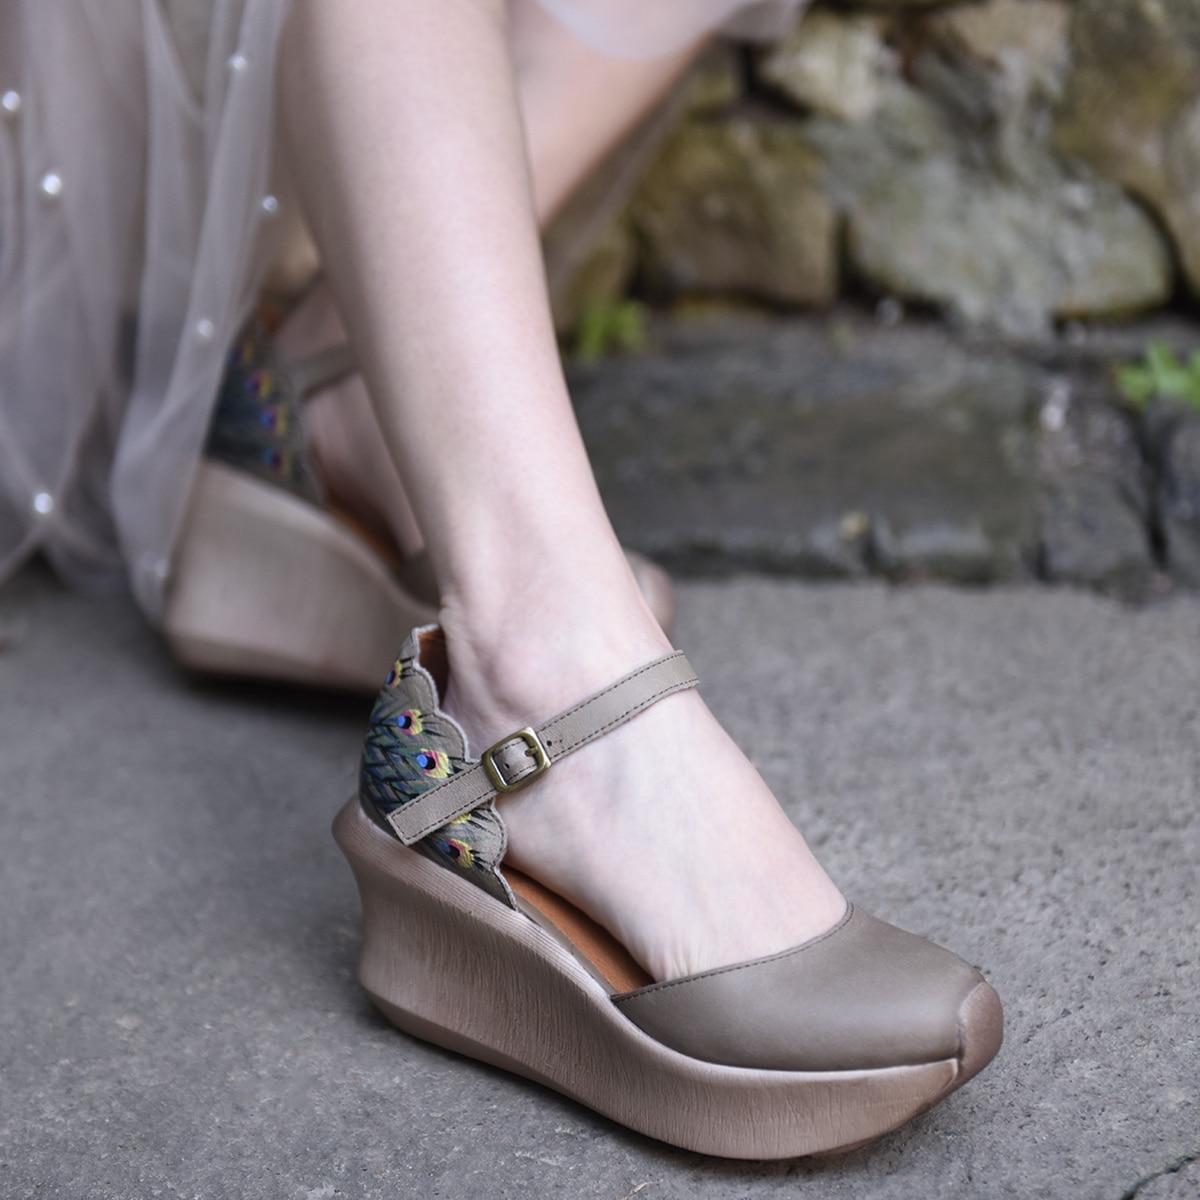 Artmu Original Folk Style Thick Sole Wedge Heels Women Sandals Buckle Genuine Leather Retro Platform Handmade Sandals High Heels